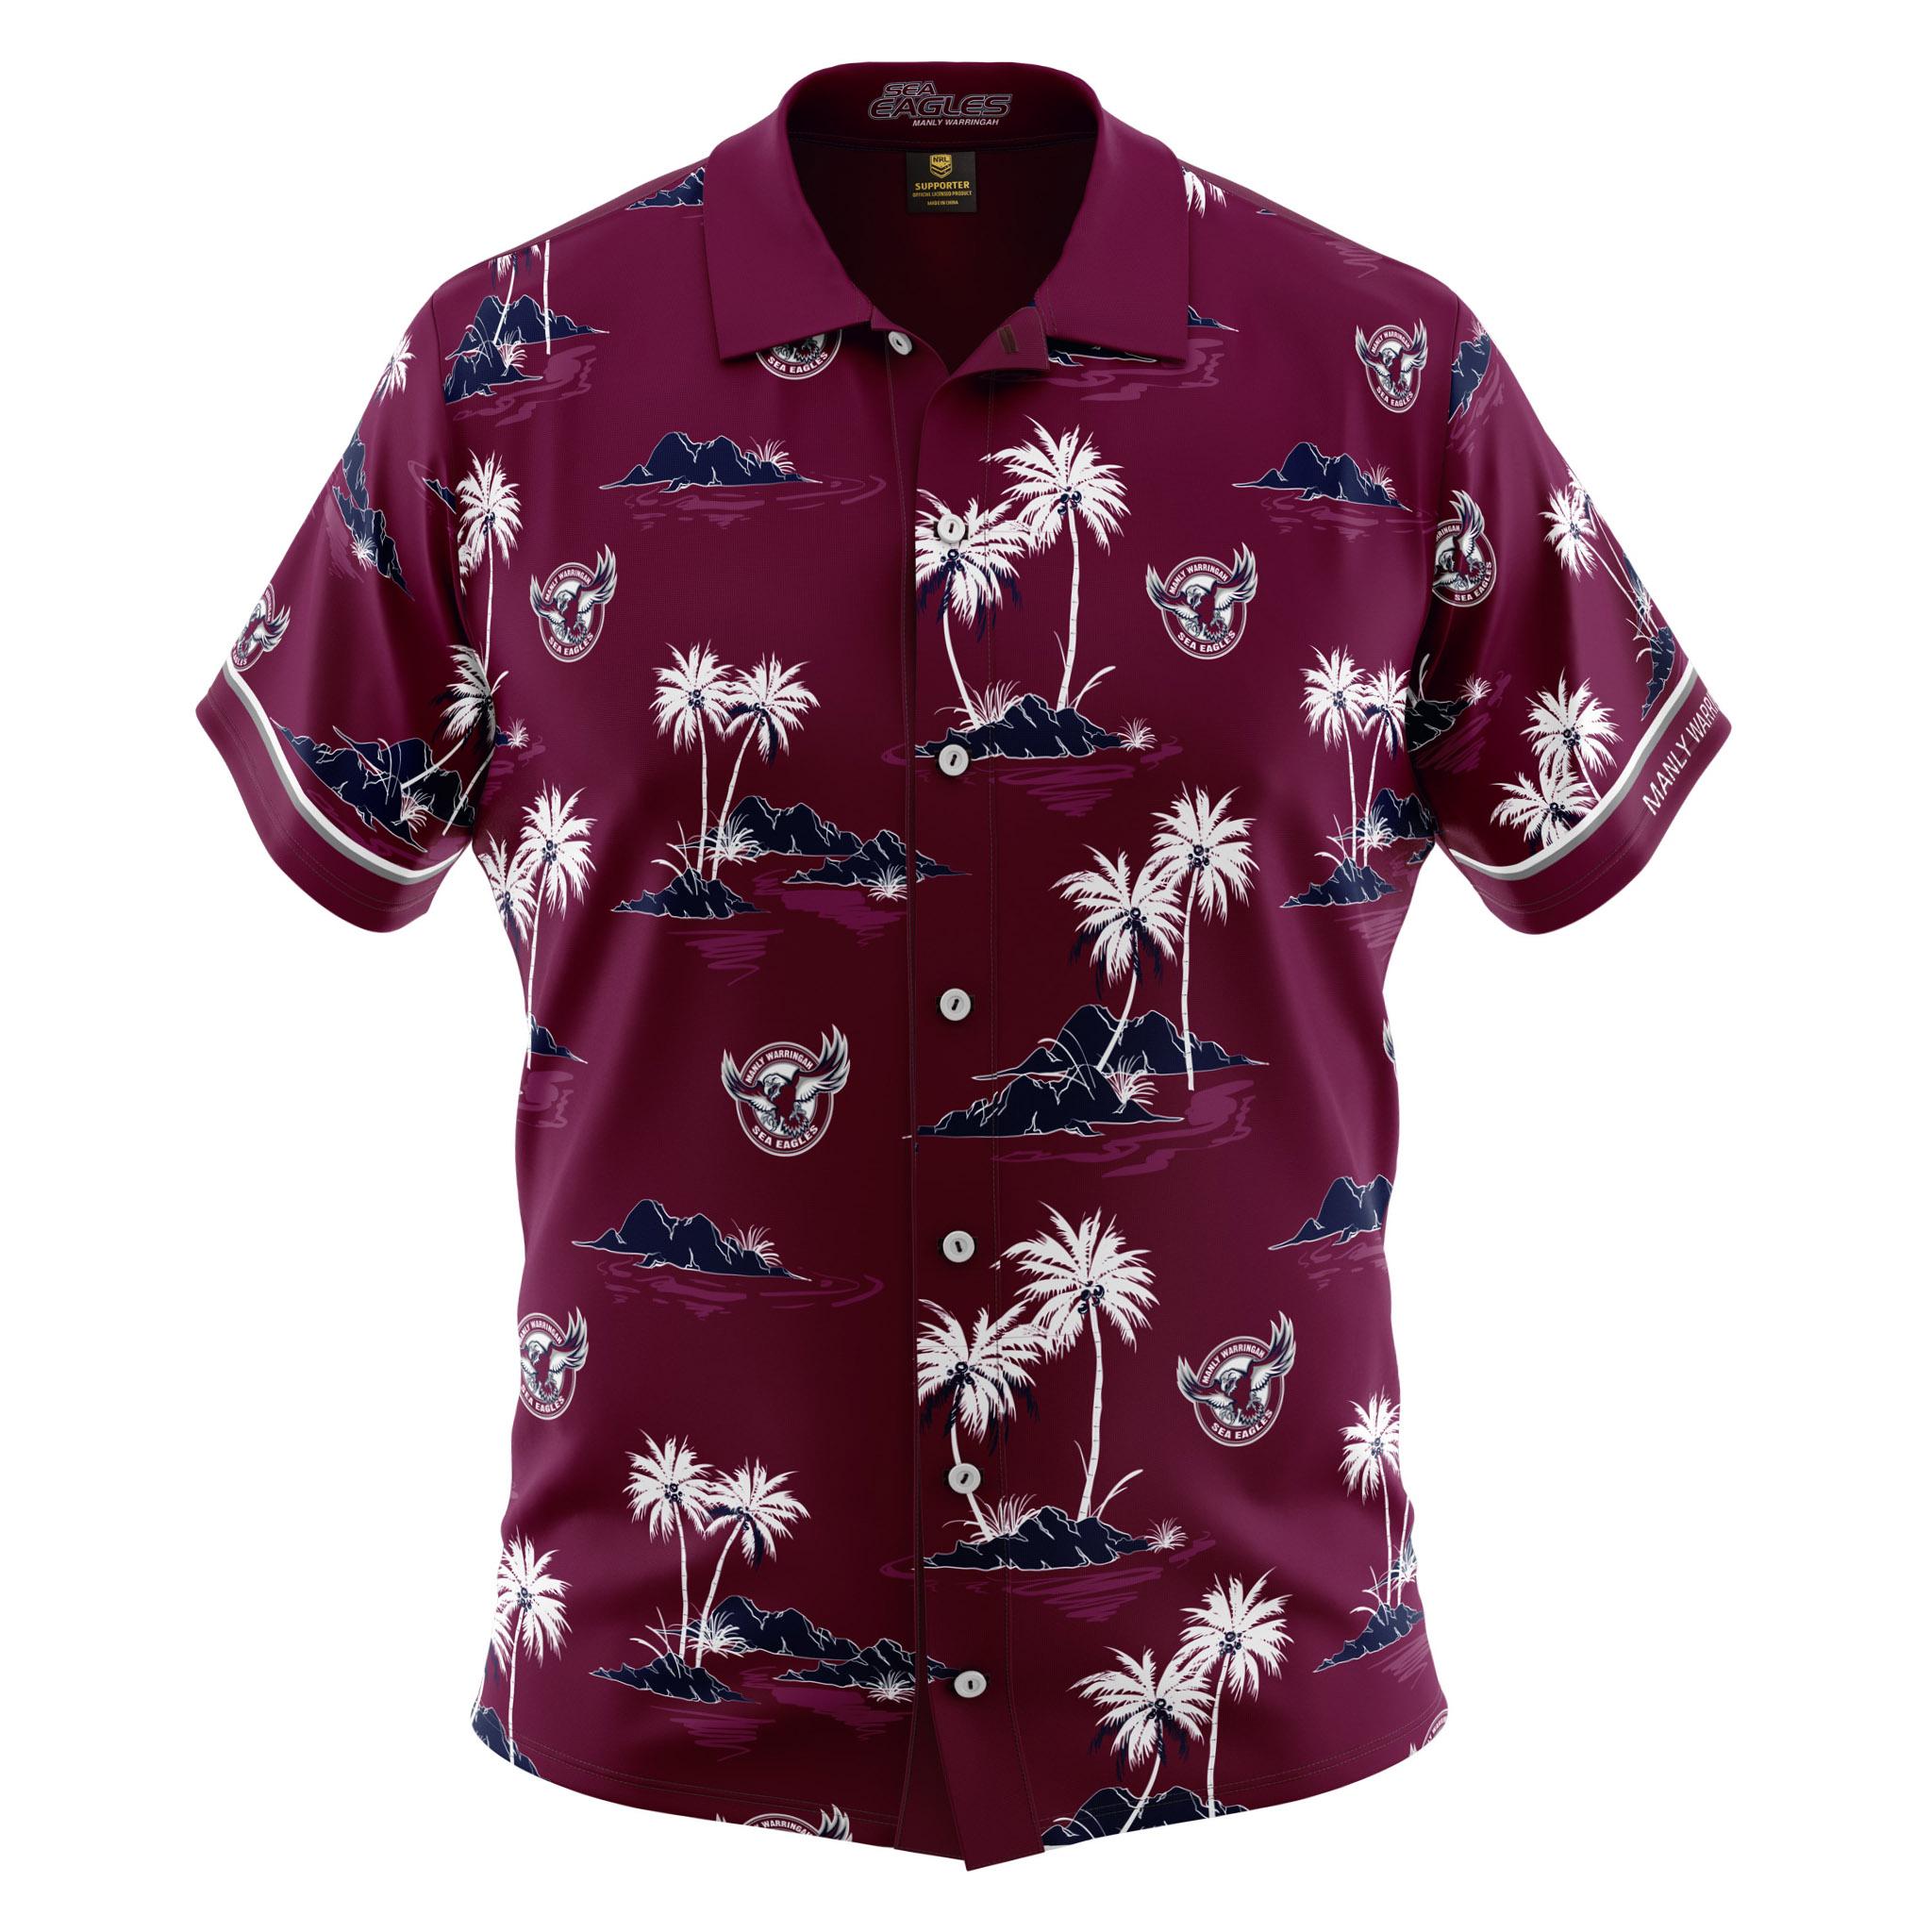 2b213a142 2019 Manly Sea Eagles Hawaiian Shirt - Adult. Shop   Collections   NRL  Hawaiian Shirts